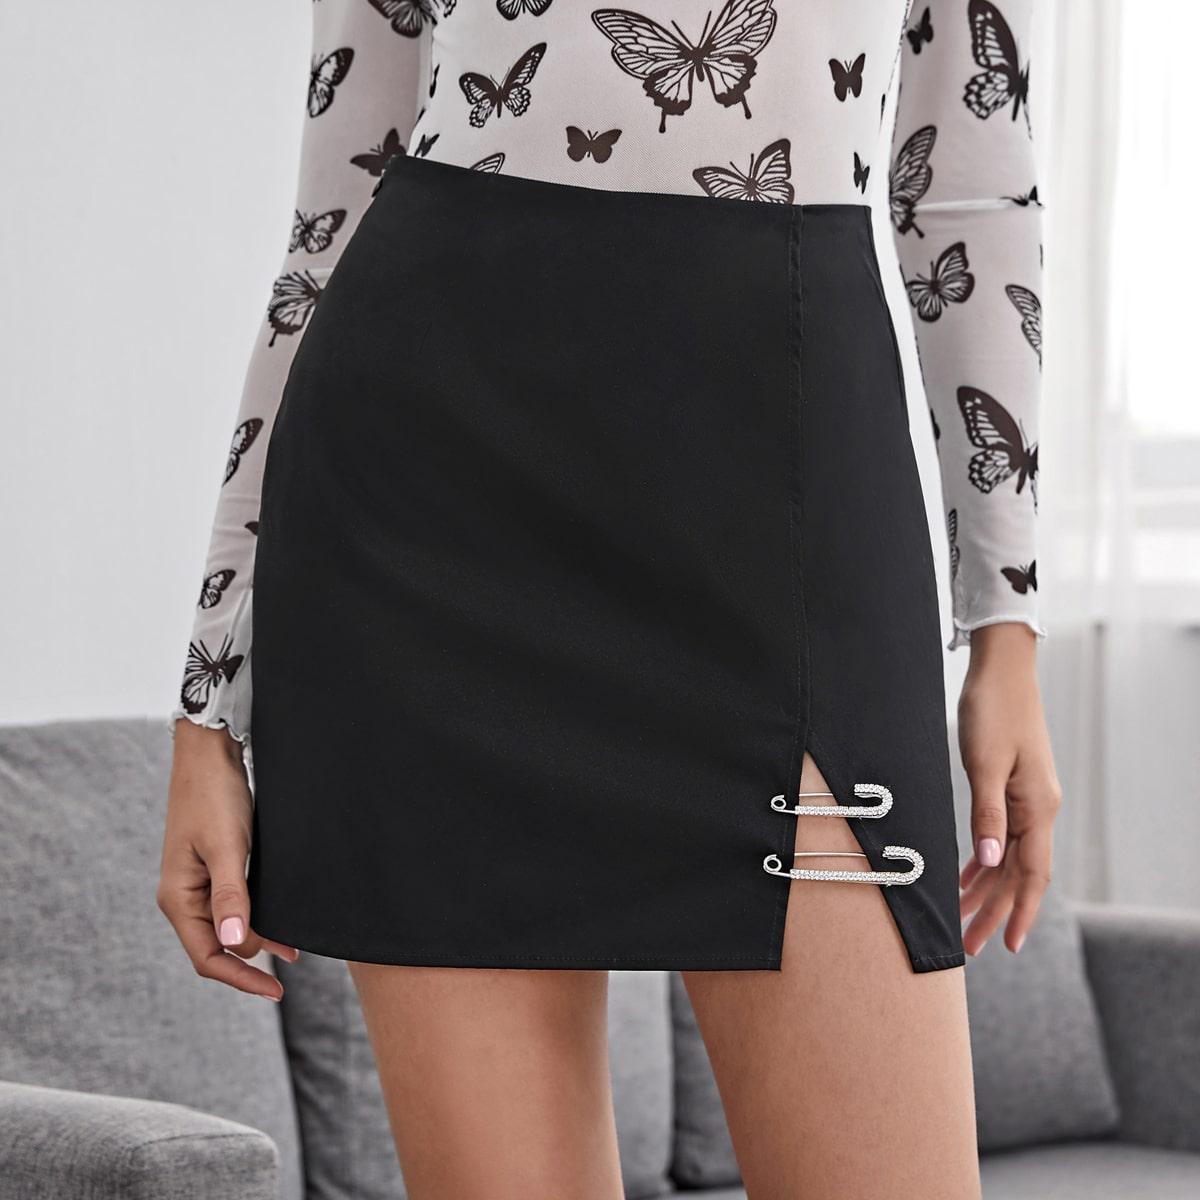 SHEIN / Zipper Side Split Hem Paperclip Detail Skirt